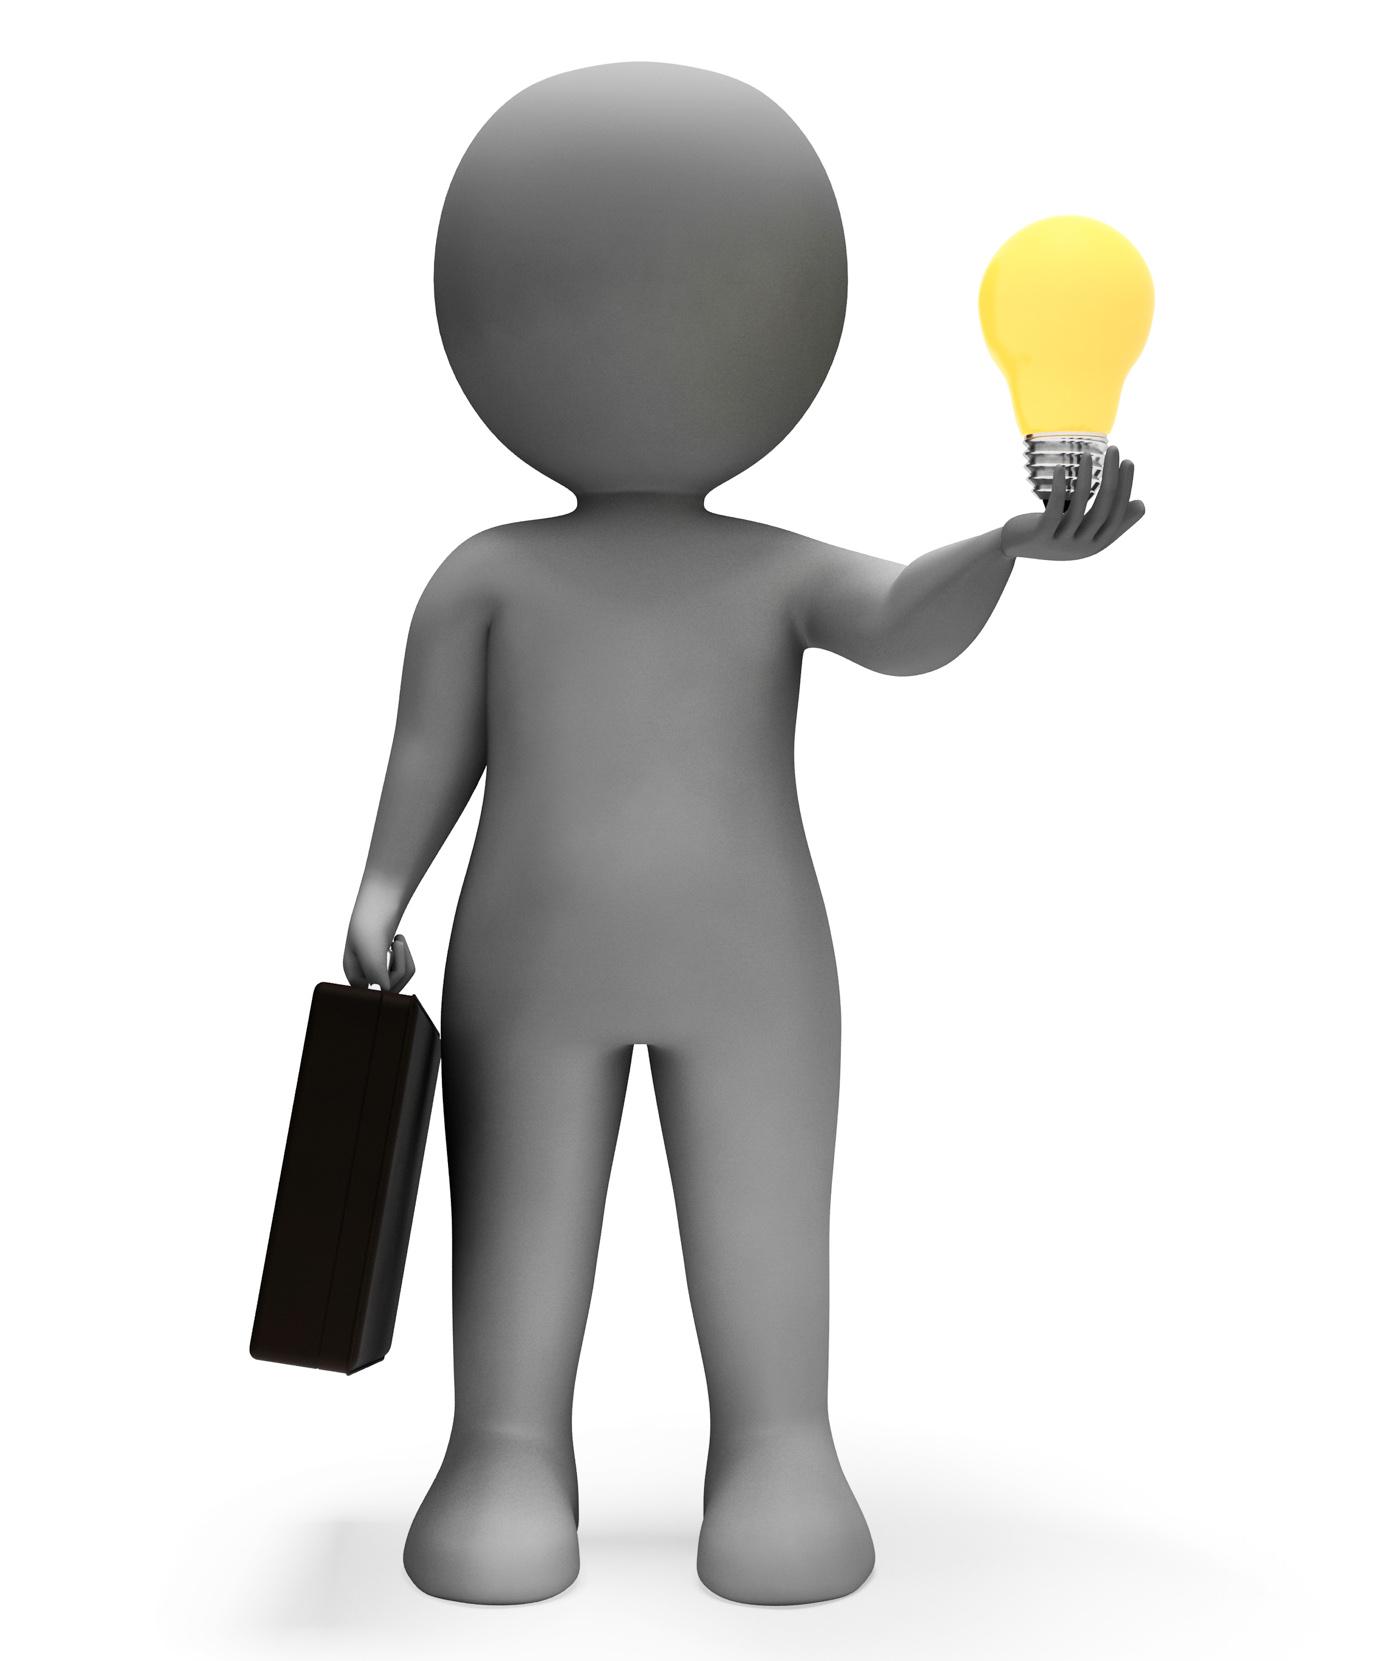 Businessman Lightbulb Shows Power Source And Character 3d Rendering, 3drendering, Power, Lamp, Lightbulb, HQ Photo